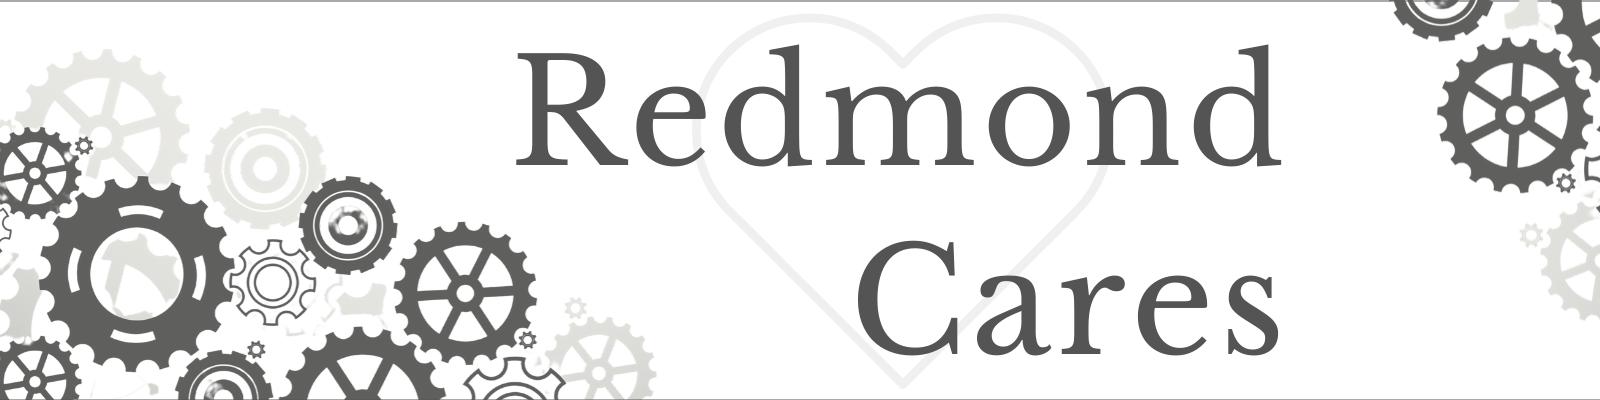 redmond cares